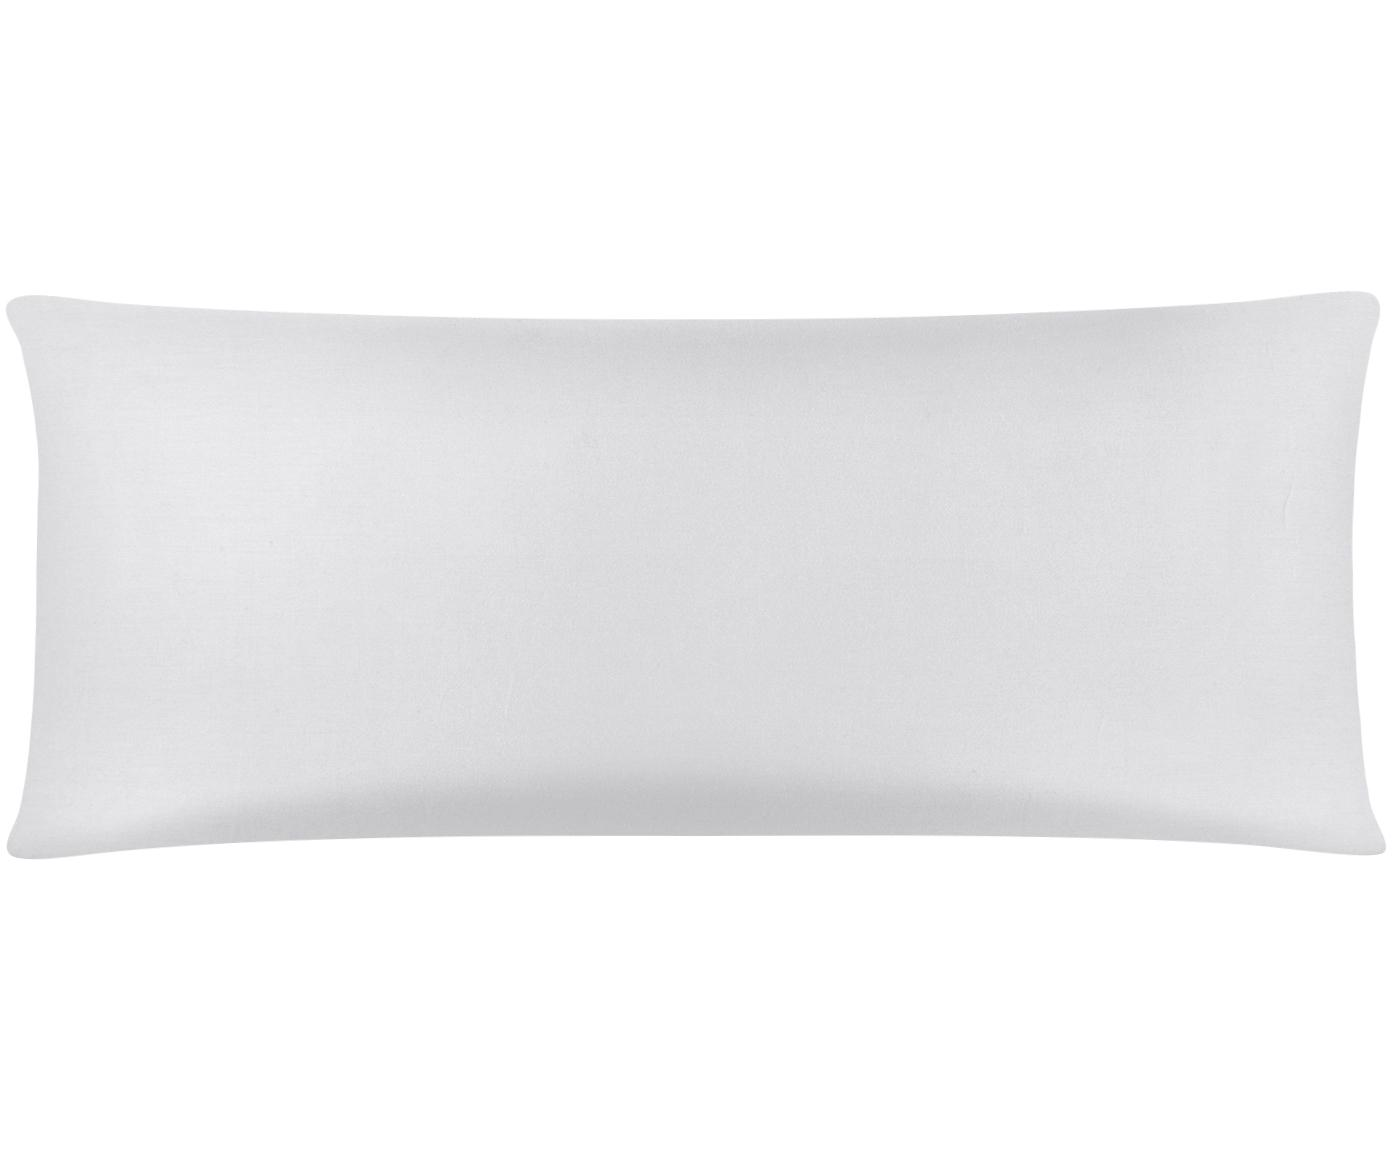 Funda de almohada de satén Comfort, Gris claro, An 45 x L 110 cm